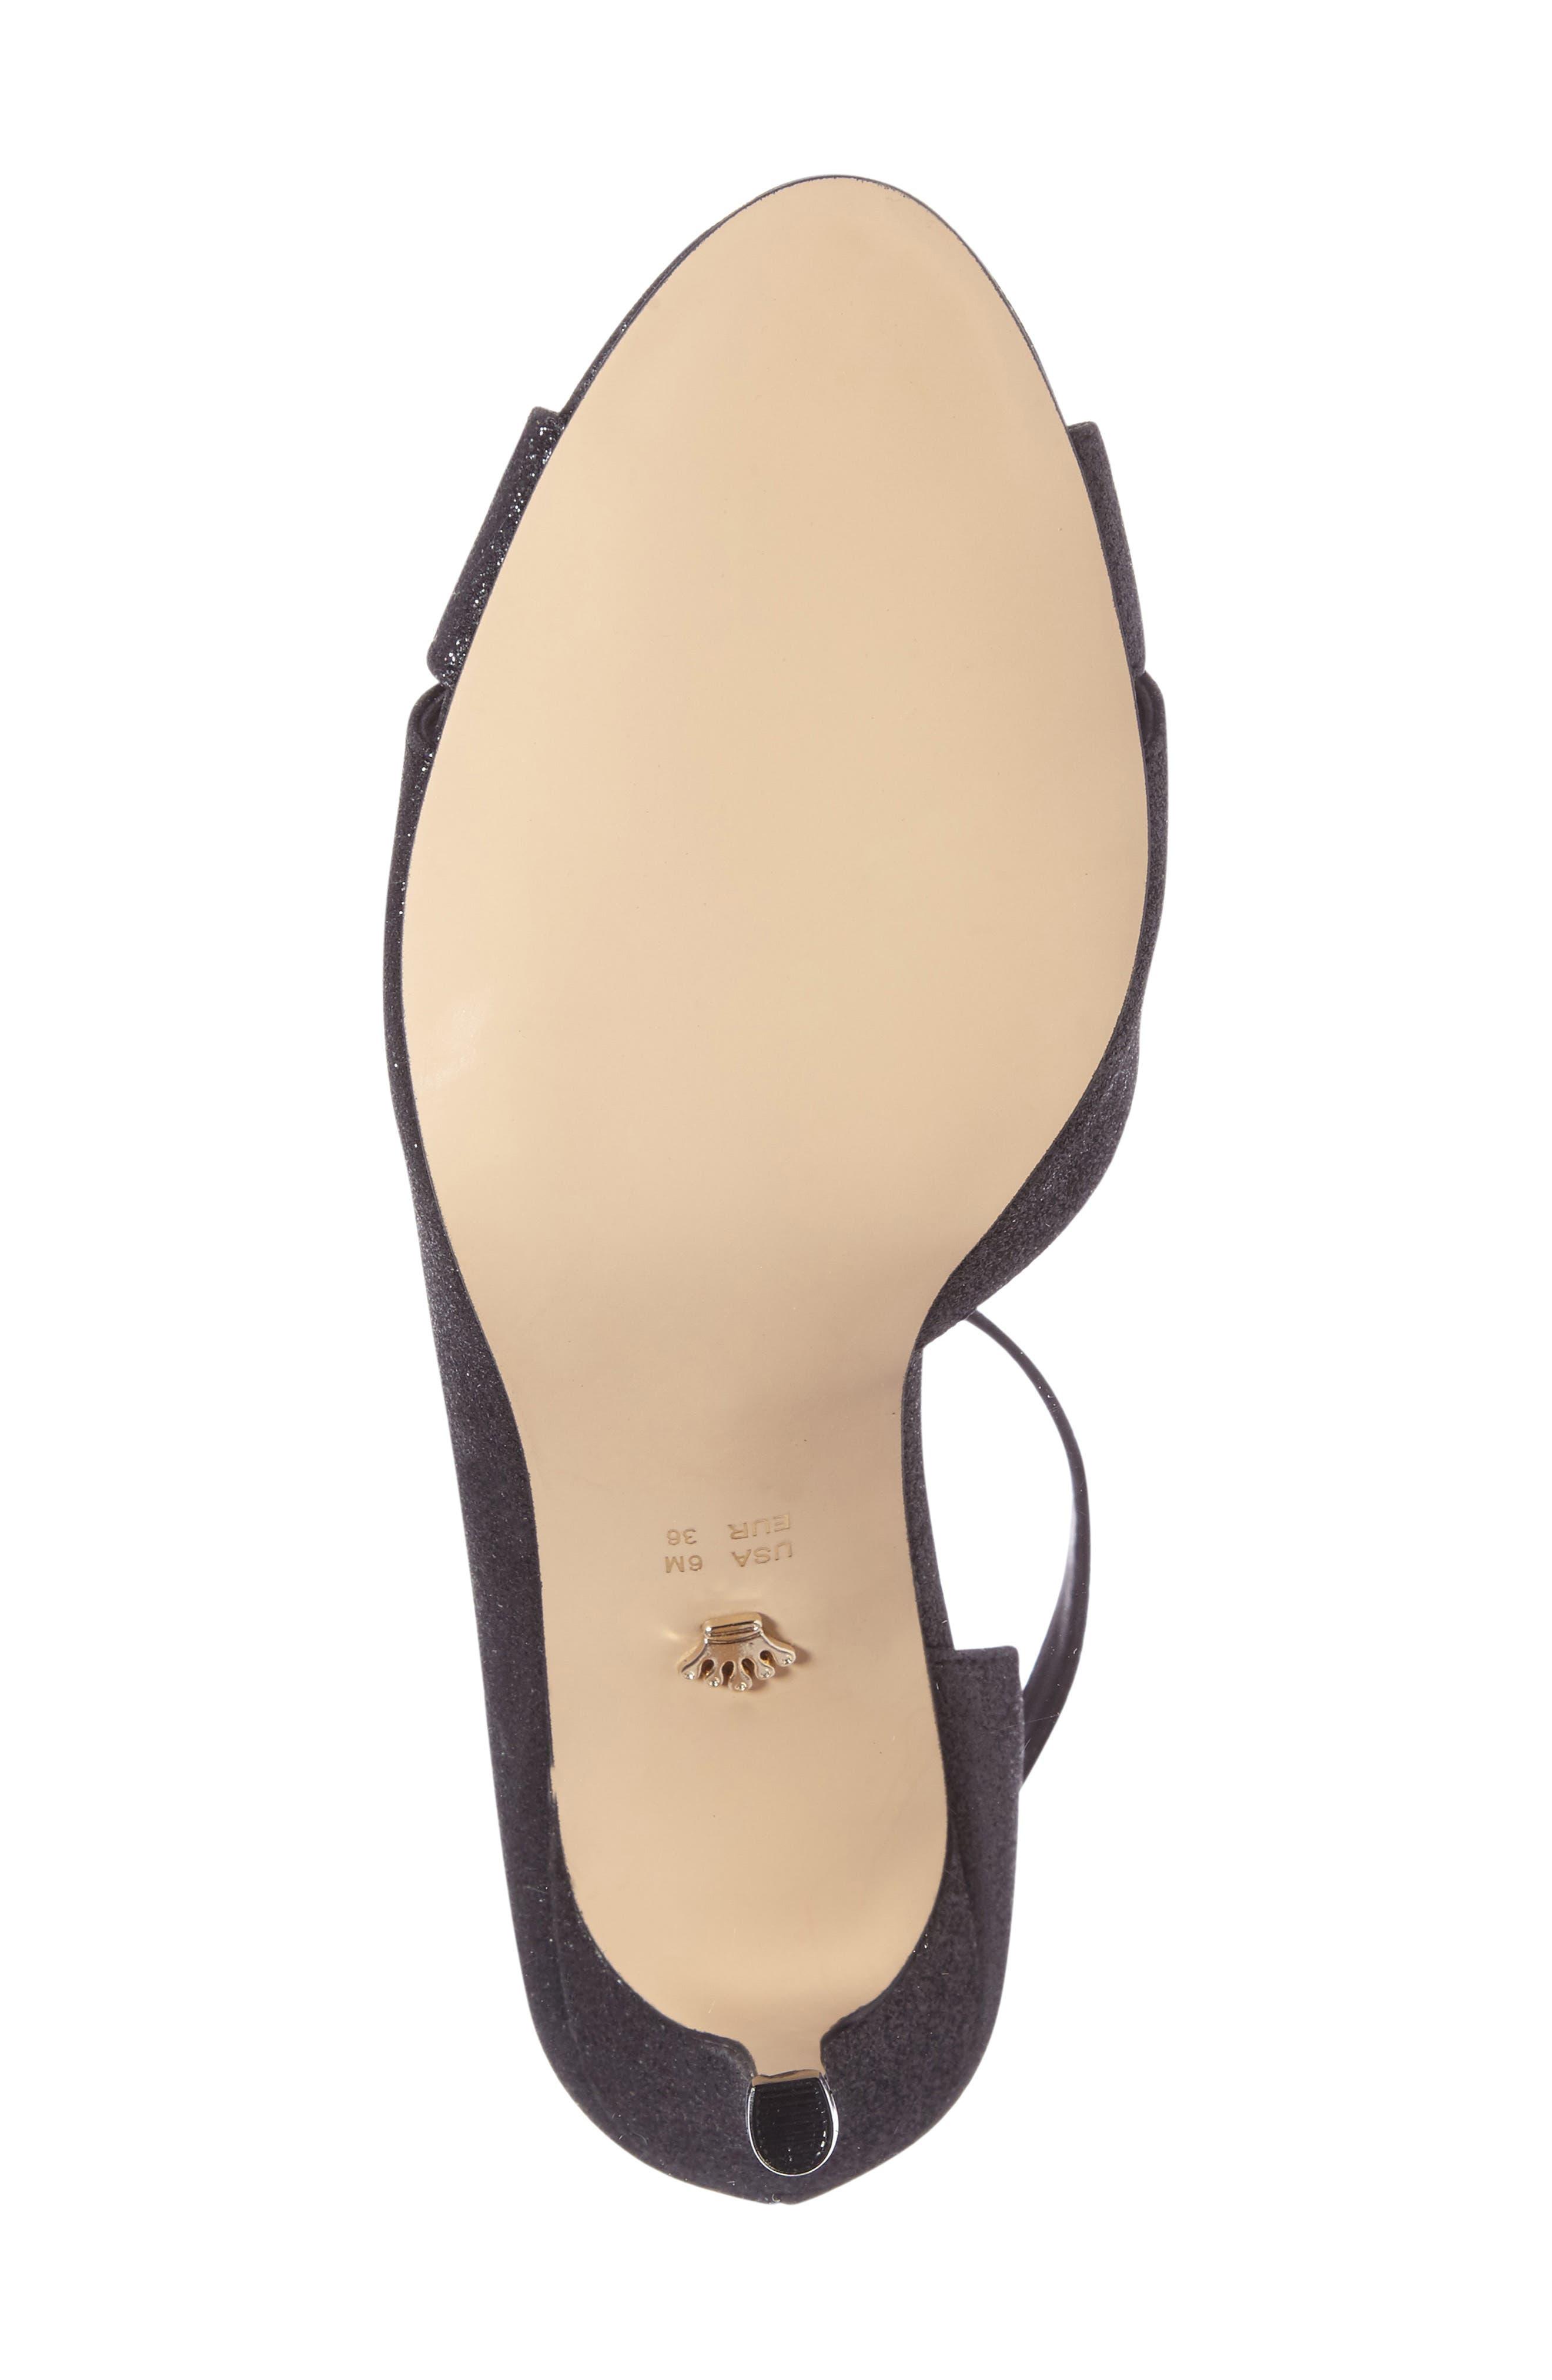 Flo Ankle Strap Sandal,                             Alternate thumbnail 4, color,                             004